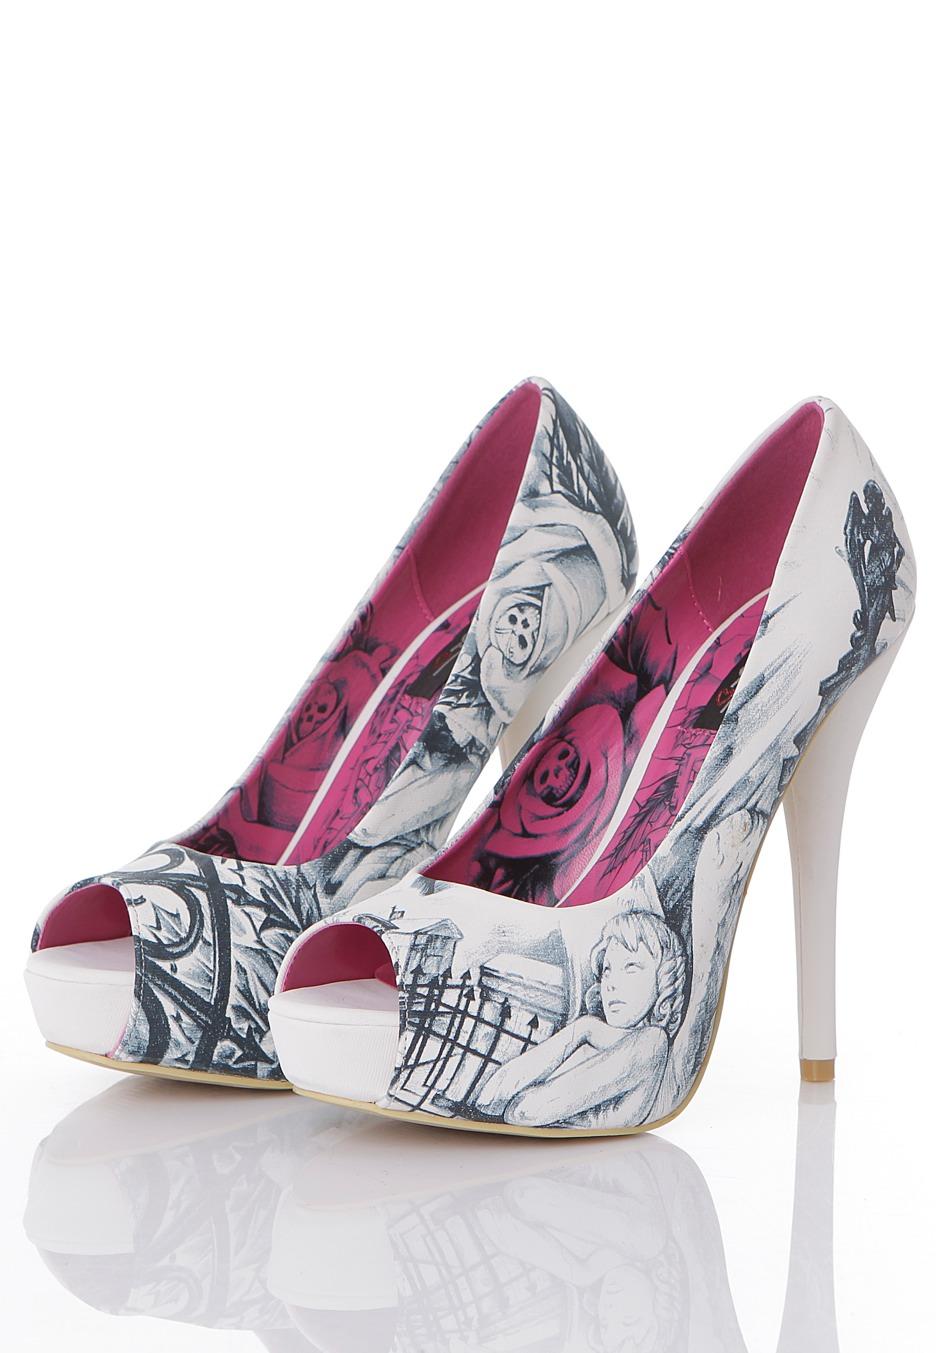 iron fist heels iron fist - gated soul white - heels - impericon.com uk gtnxqkv